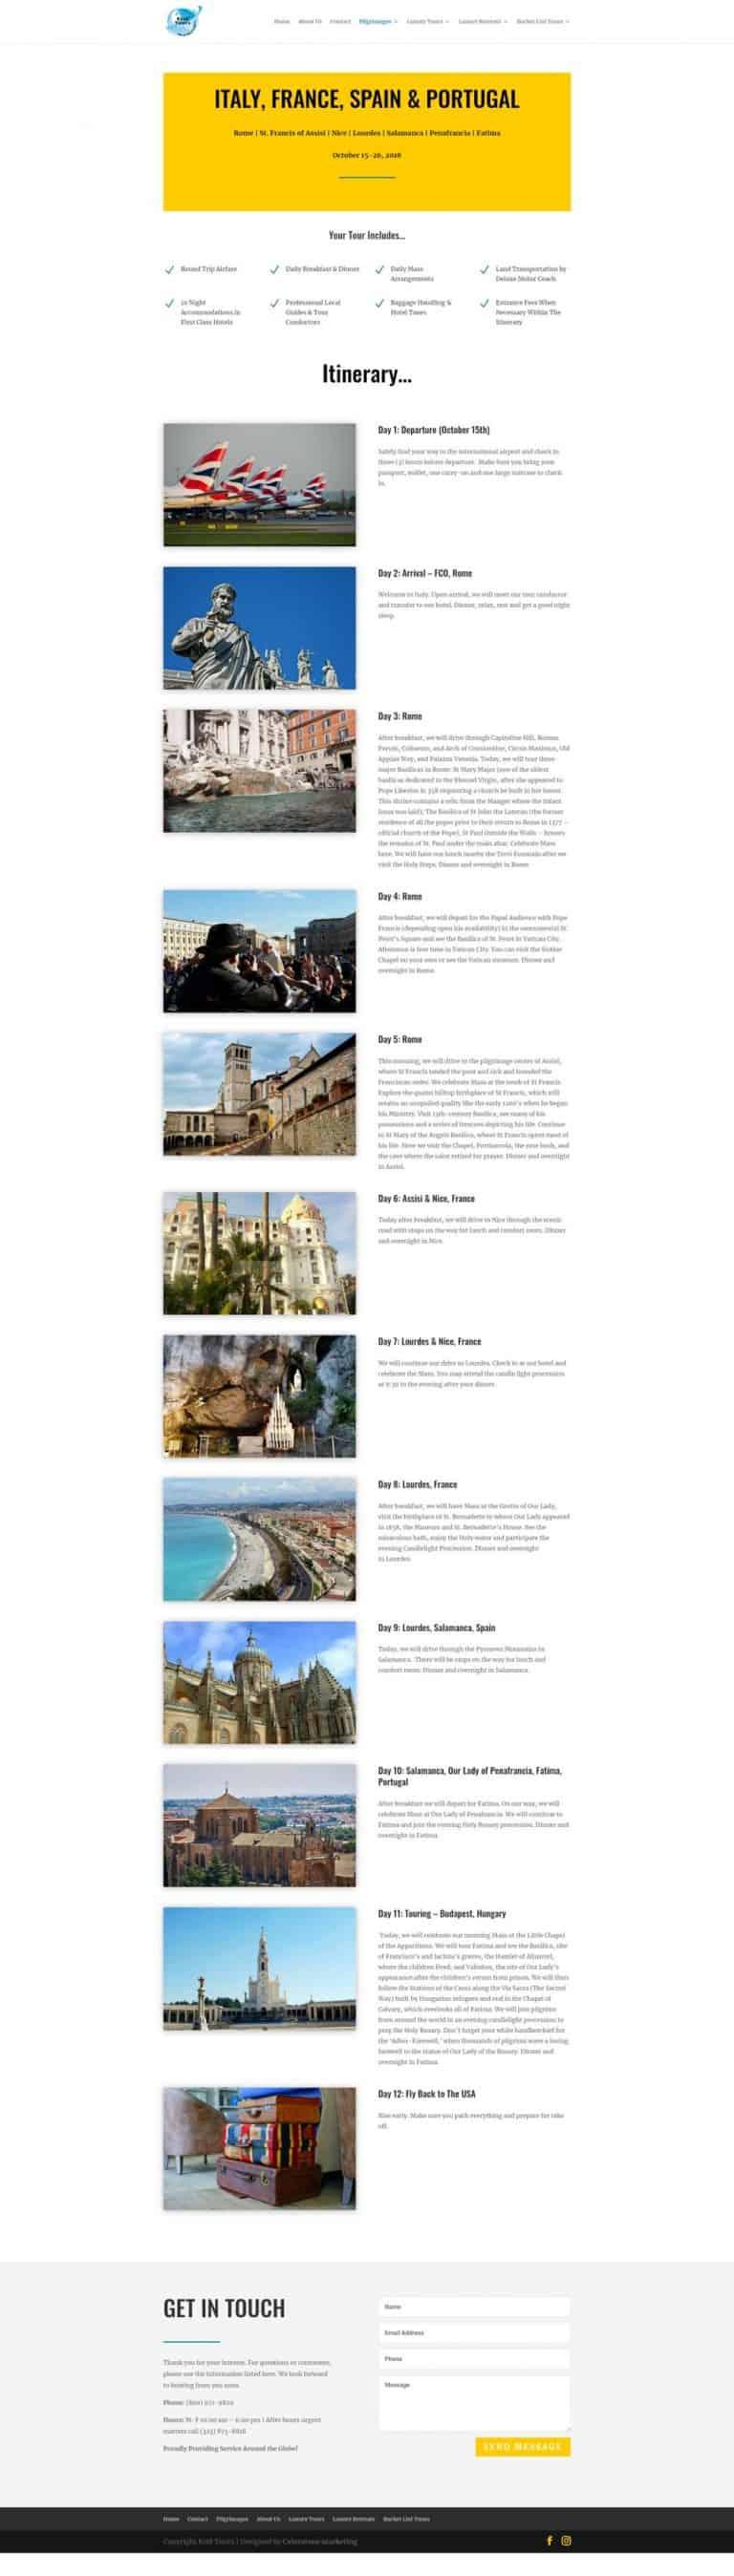 tour breakdown page